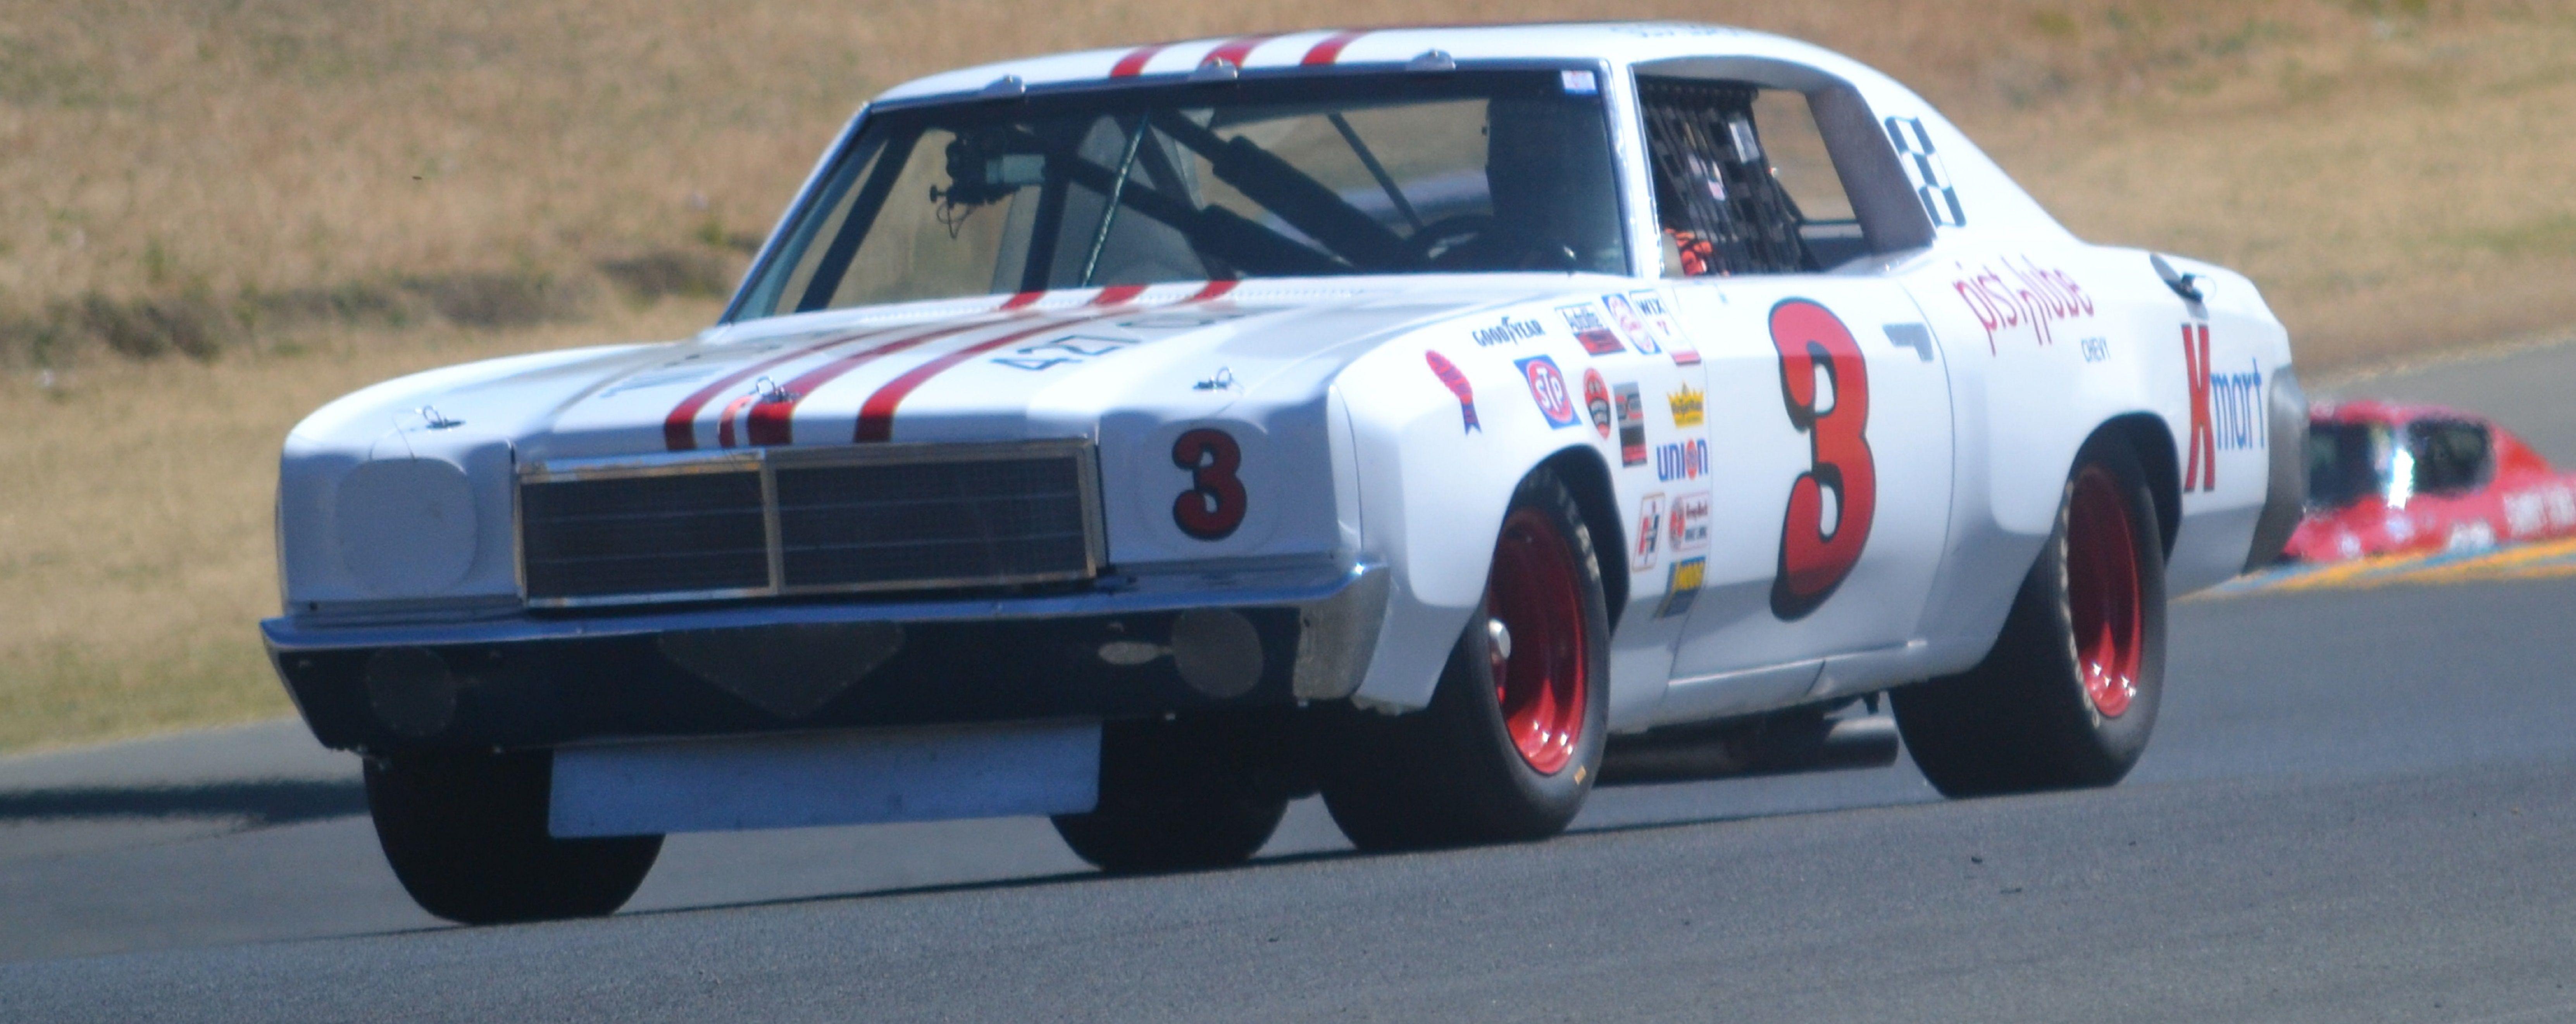 1971 Chevrolet Monte Carlo Coupe NASCAR Race Car - Pictures ...